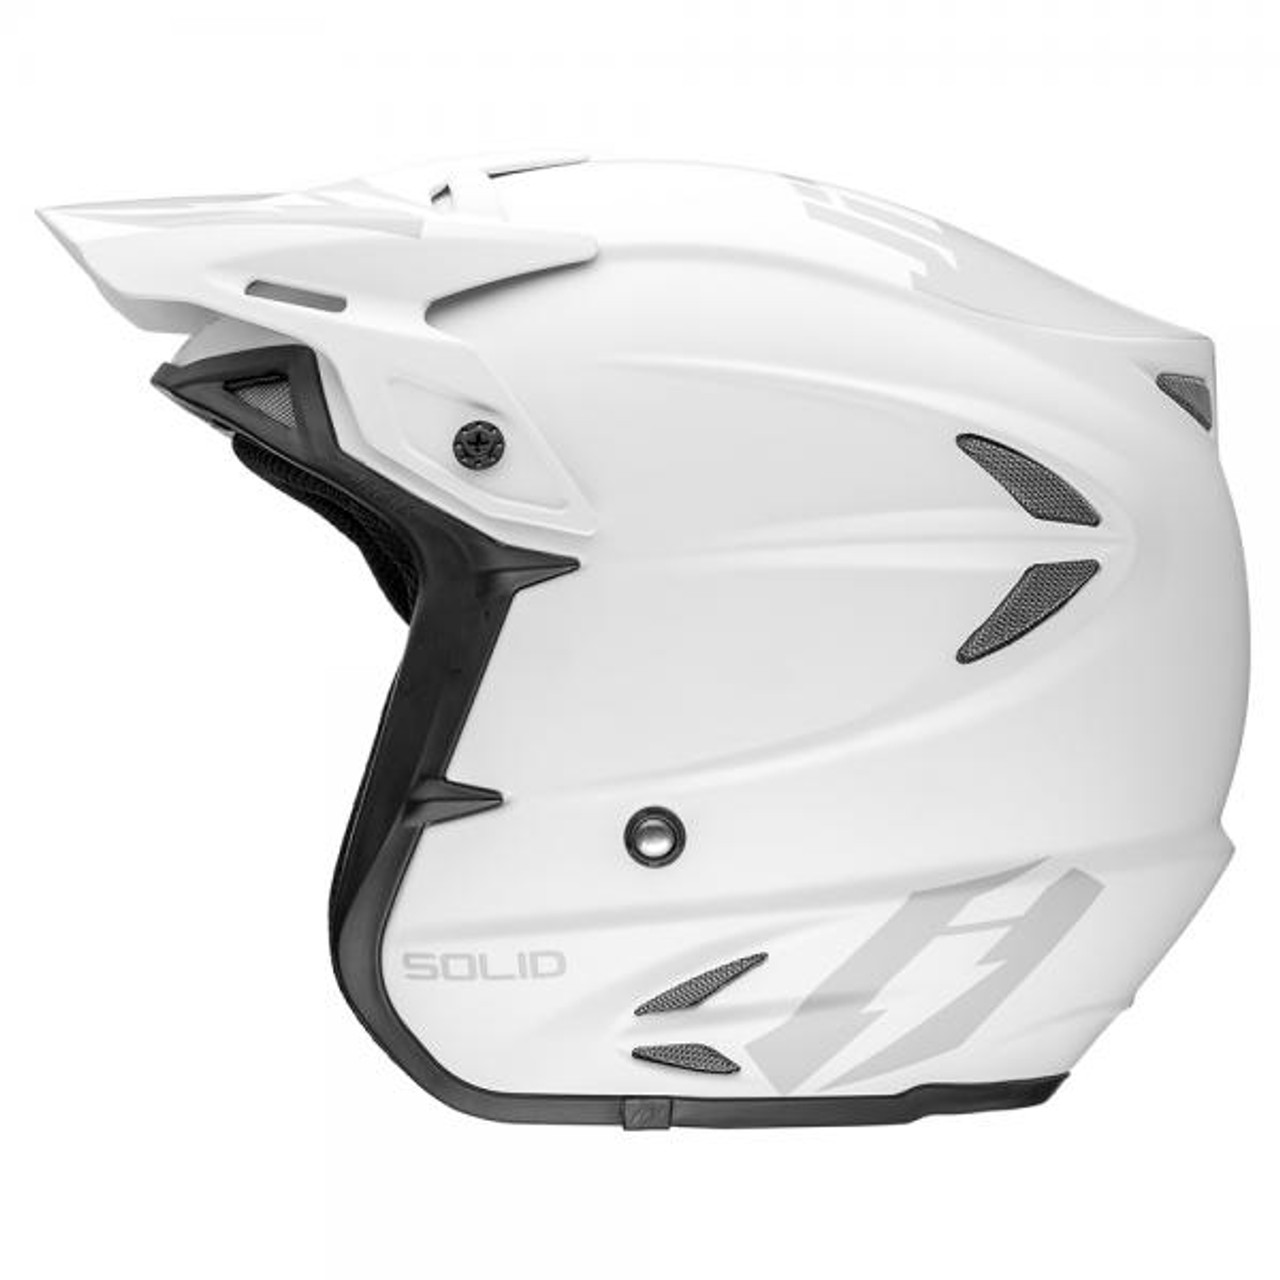 HT2 Solid helmet by Jitsie, matt white/ grey, fiberglass